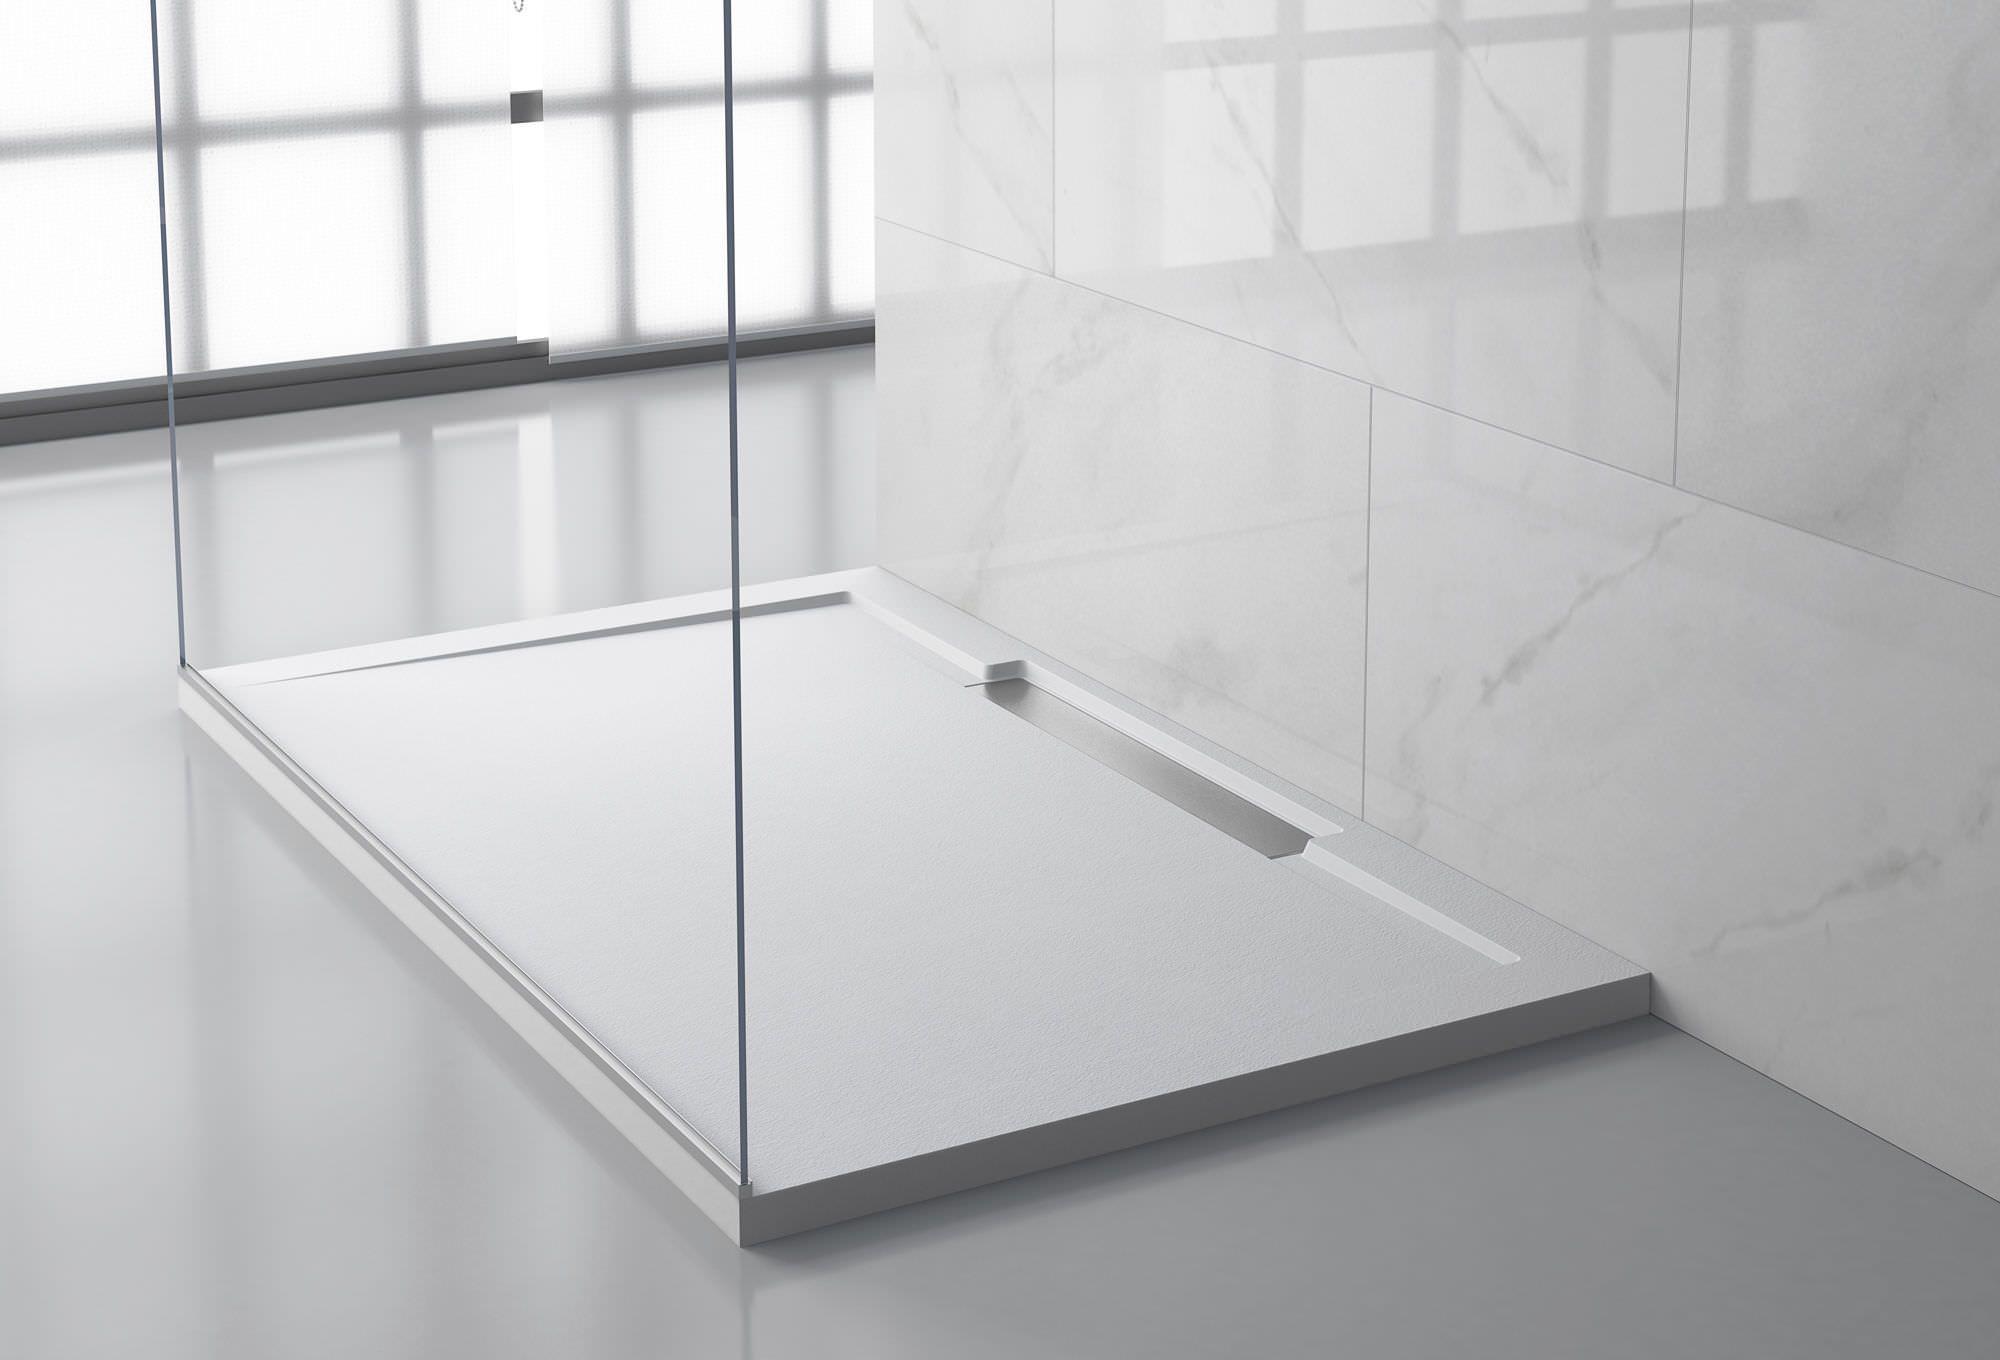 acrylic panels for bathroom walls%0A Rectangular shower base   acrylic   custom  LINE Y  HIDROBOX